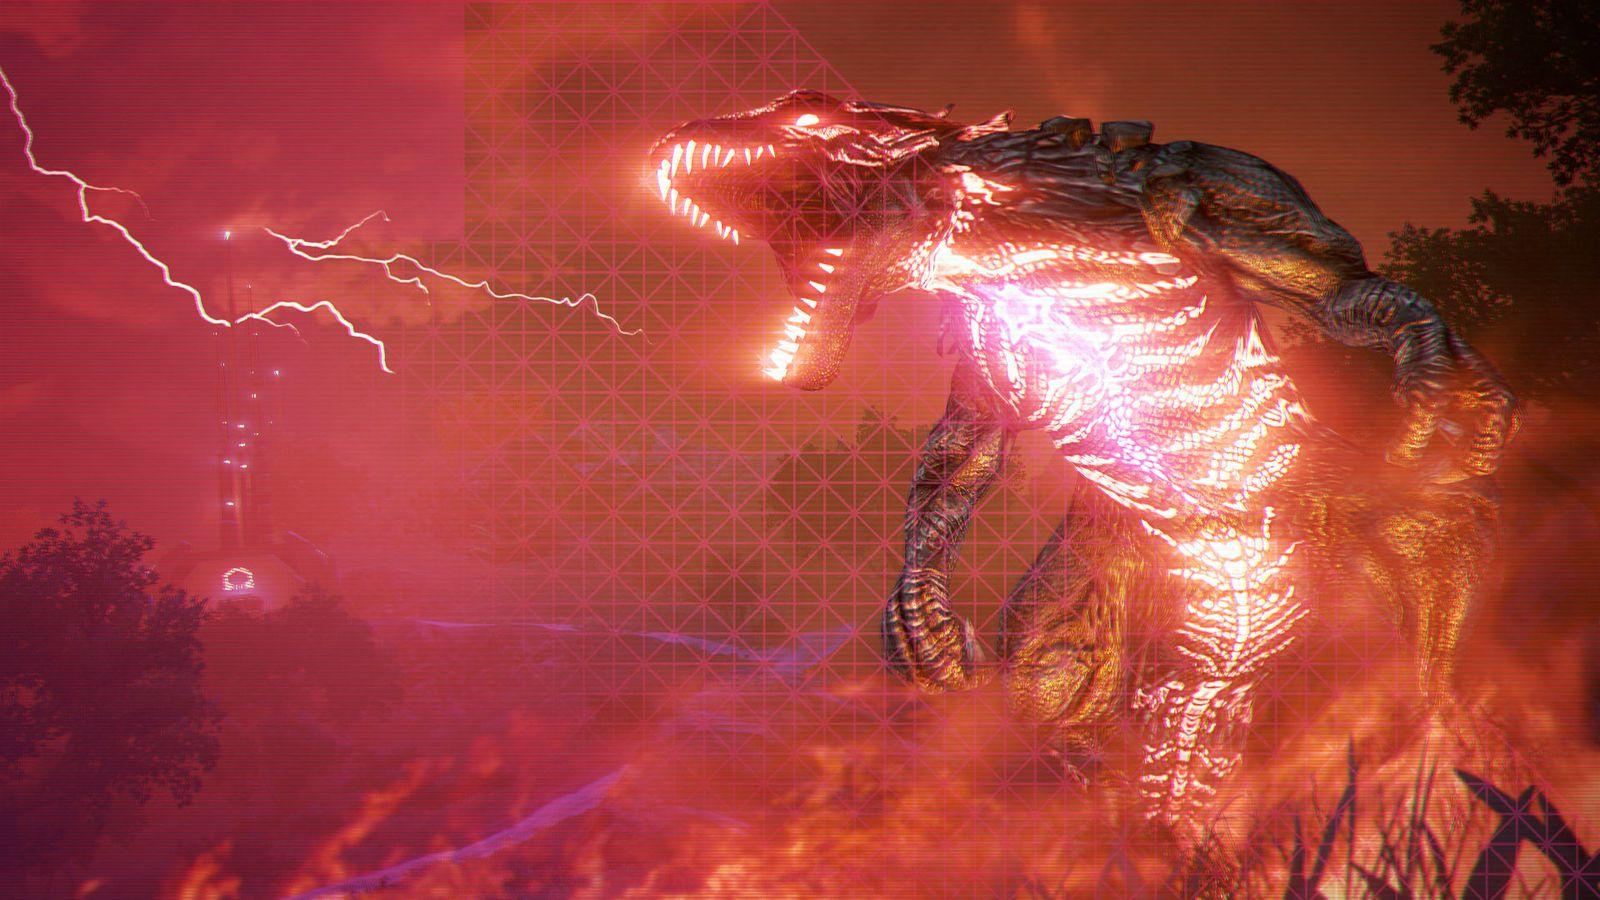 Far Cry 3: Blood Dragon review: cold war kids | Polygon